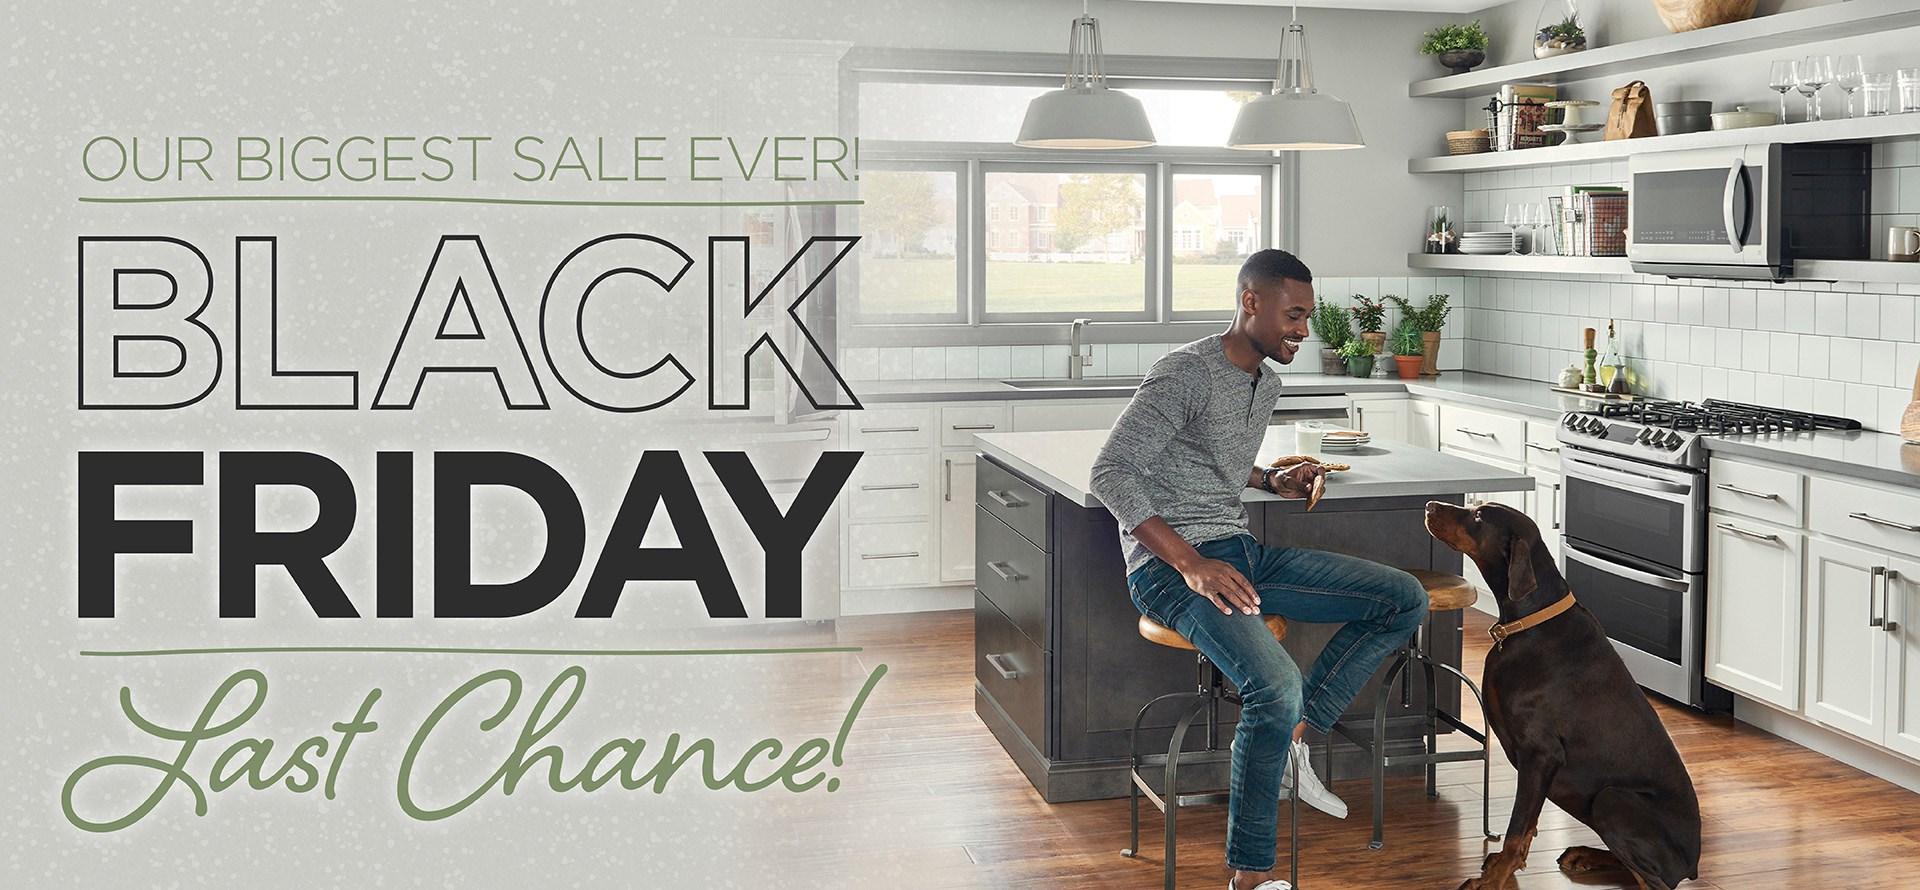 Furniture & ApplianceMart Black Friday Last Chance Sale